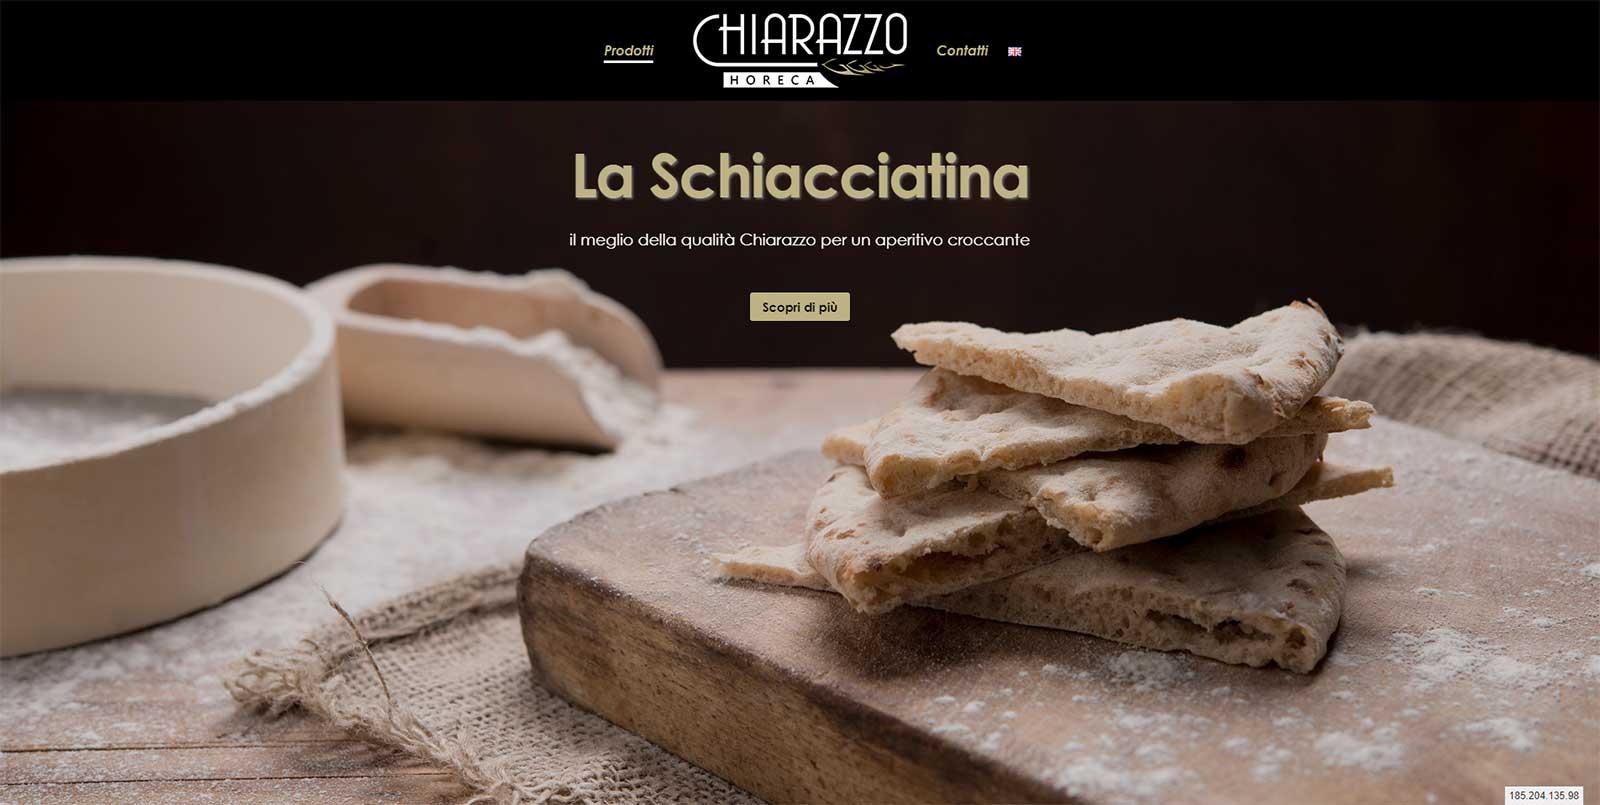 Chiarazzo Horeca